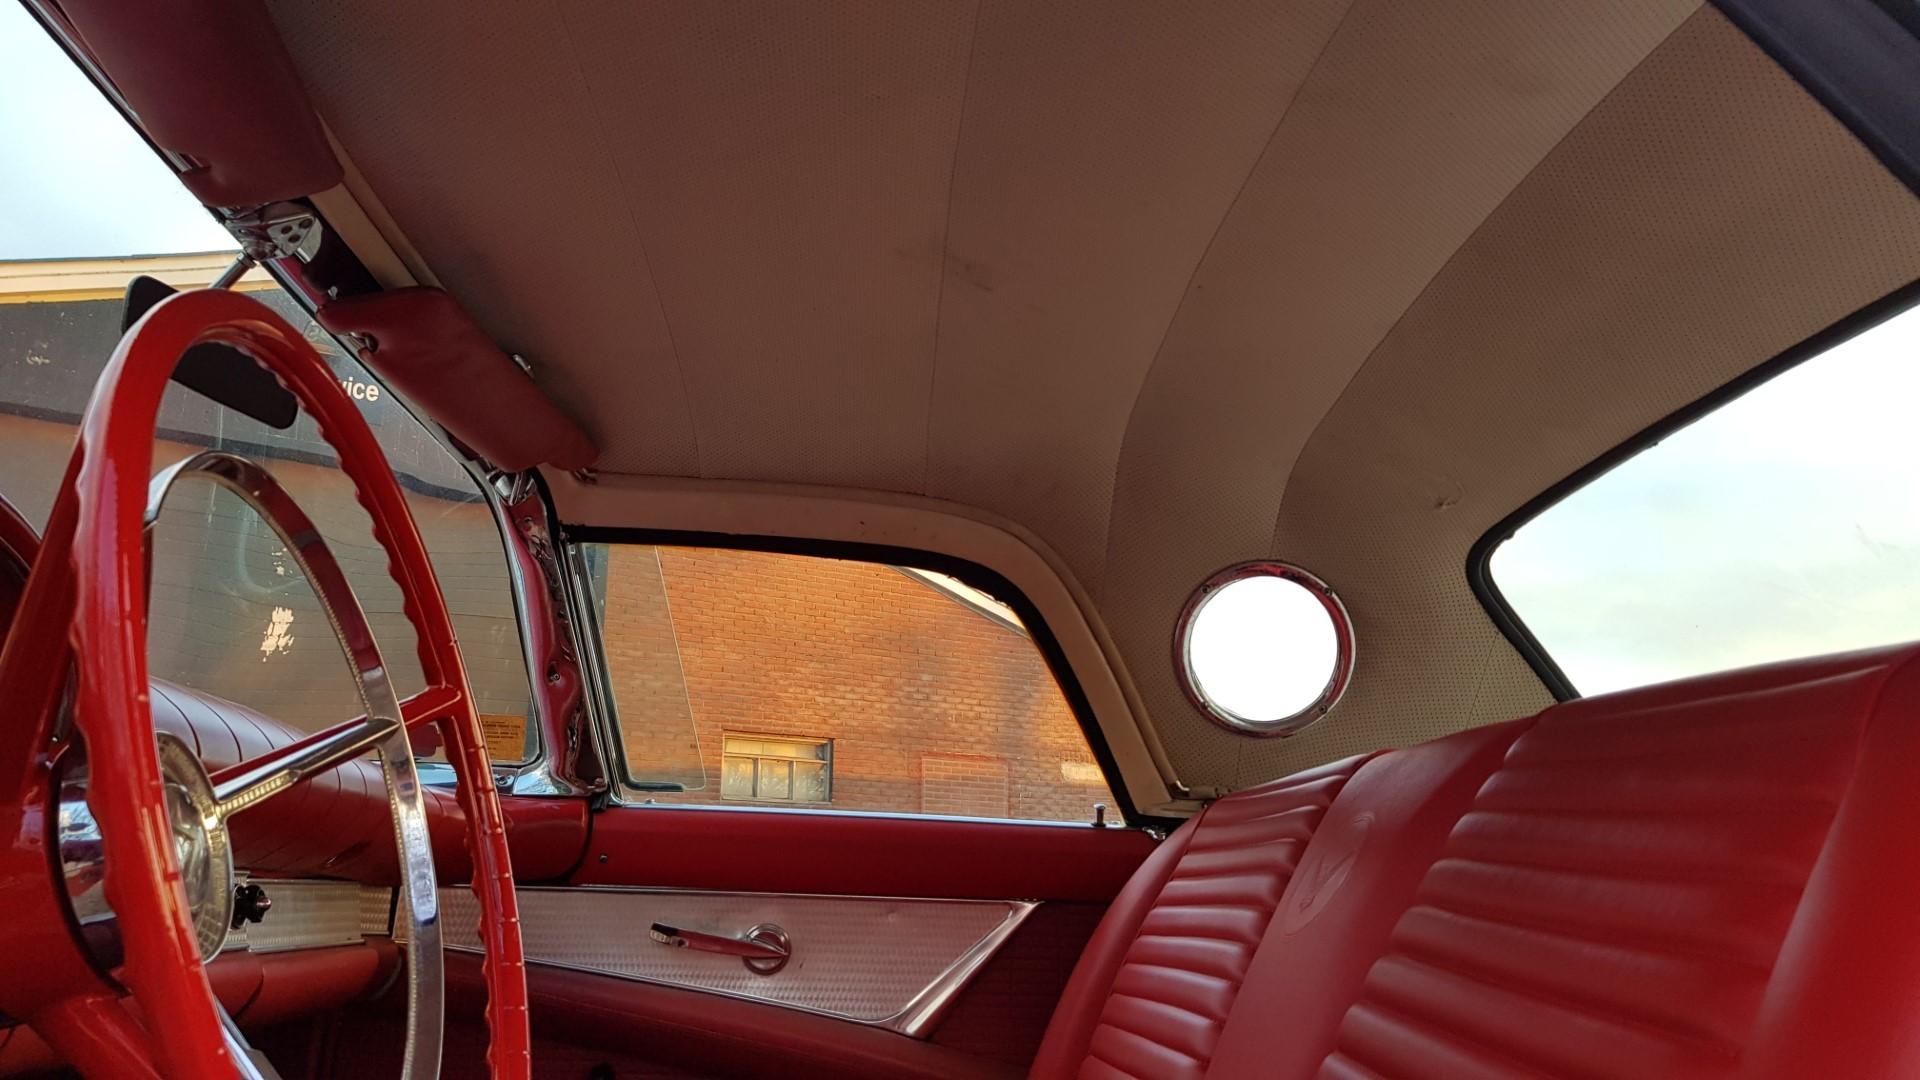 1957 Ford Thunderbird Convertible 312ci (12)